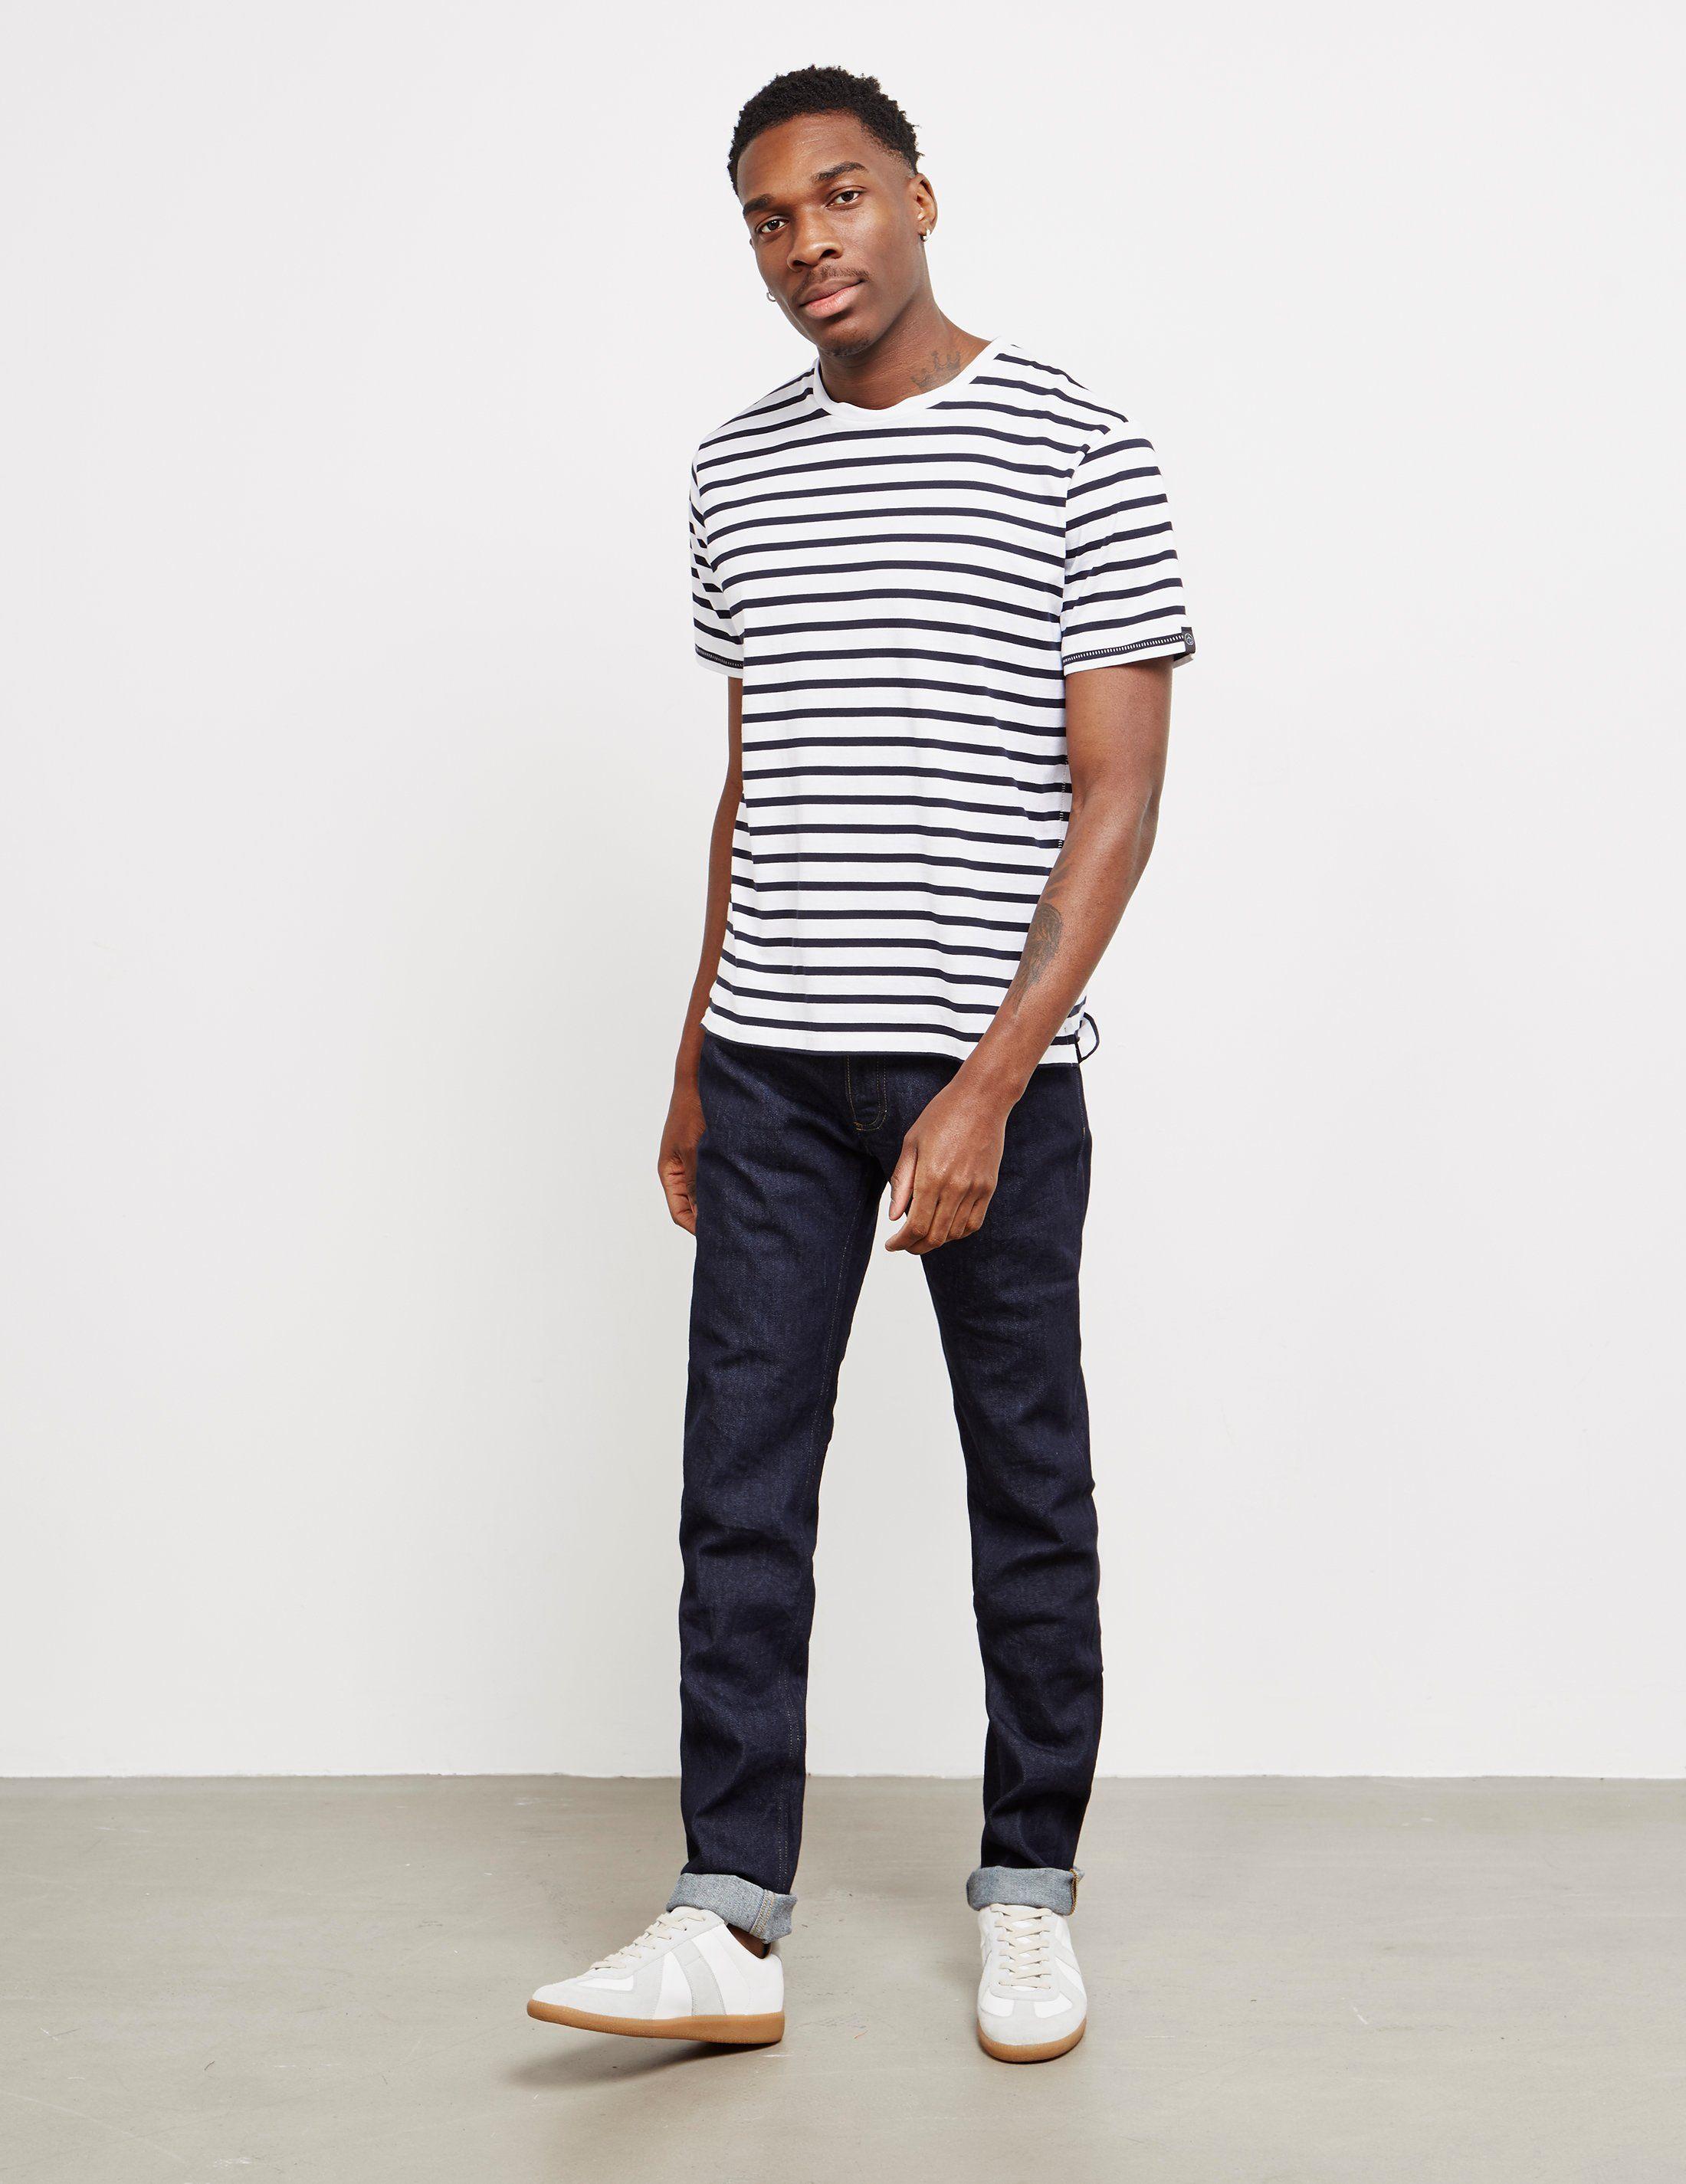 Maison Margiela Resin Jeans